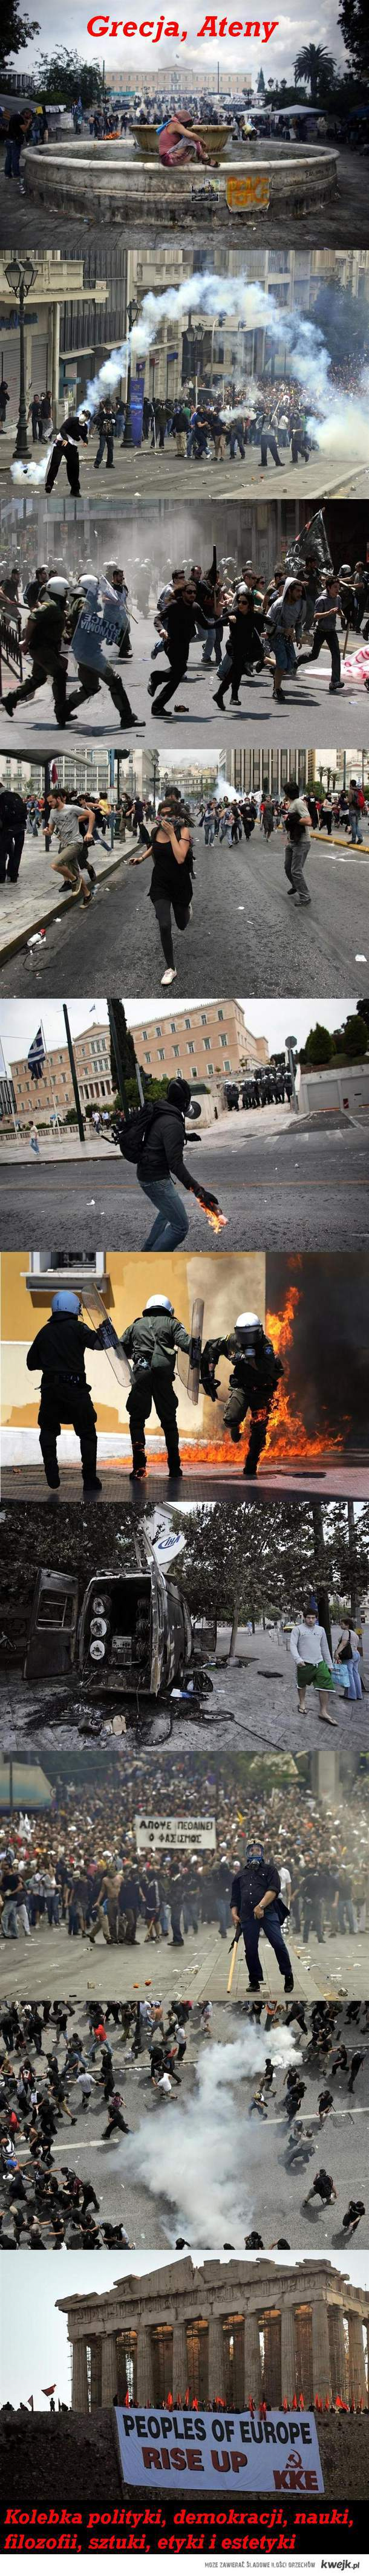 Grecja, kolebka demokracji